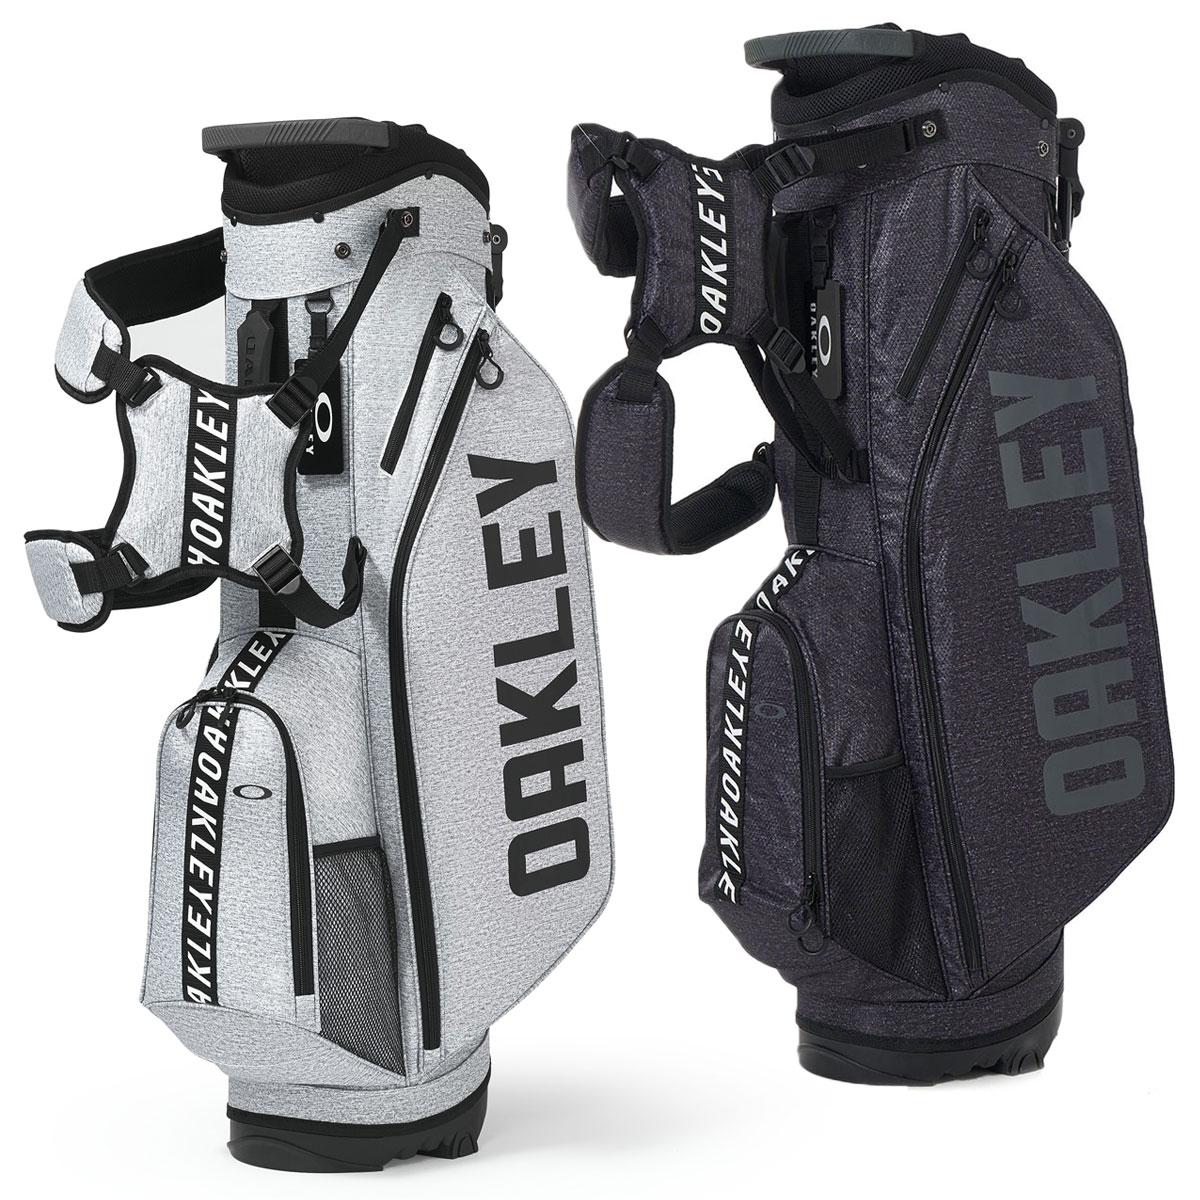 cefd84b5e61a Details about Oakley Mens 2019 Bg Stand 12.0 Padded Lightweight Carry Golf  Bag